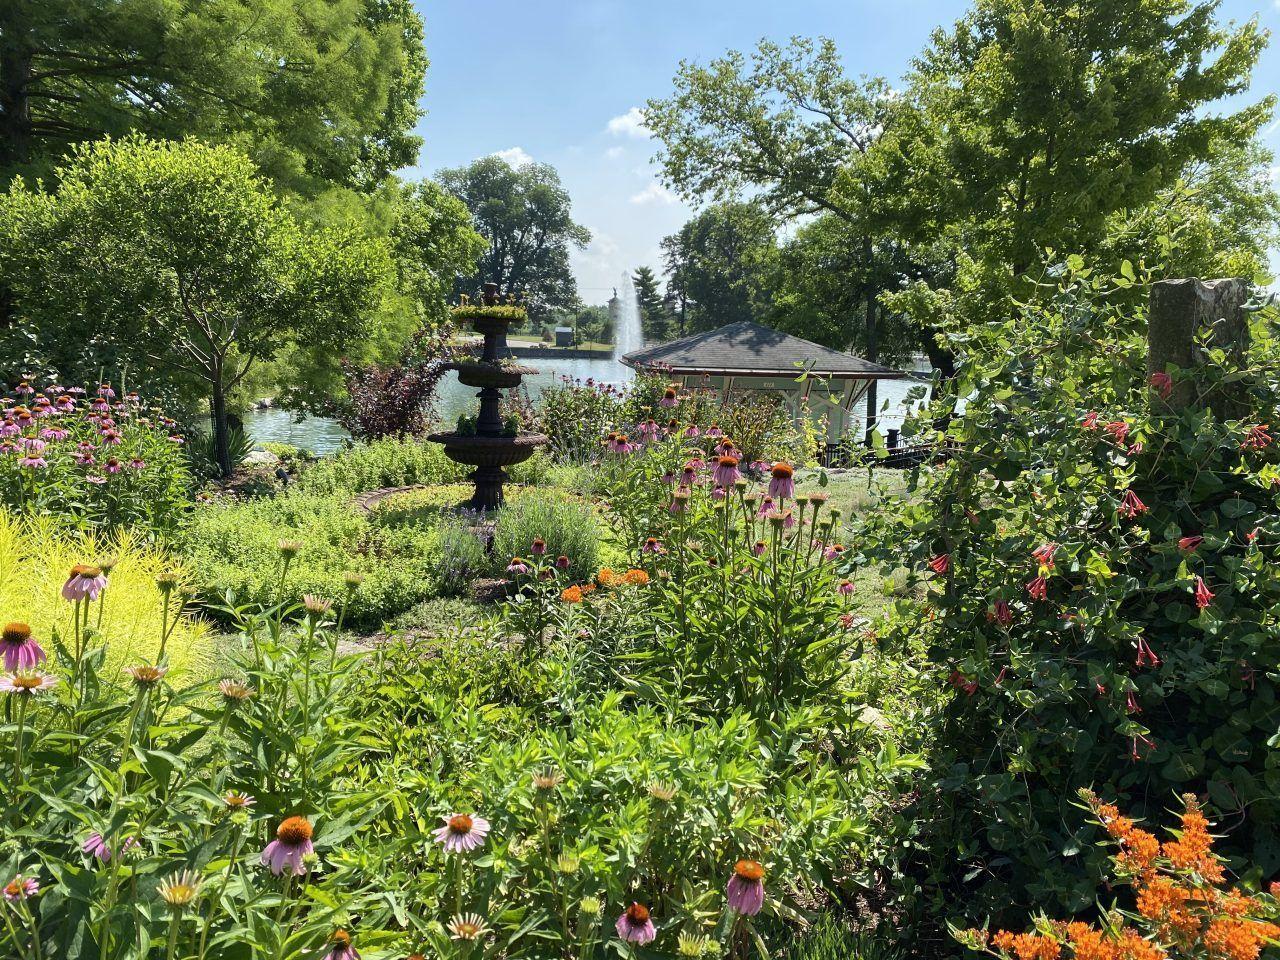 5. Elizabeth Rohrer Memorial Butterfly Garden